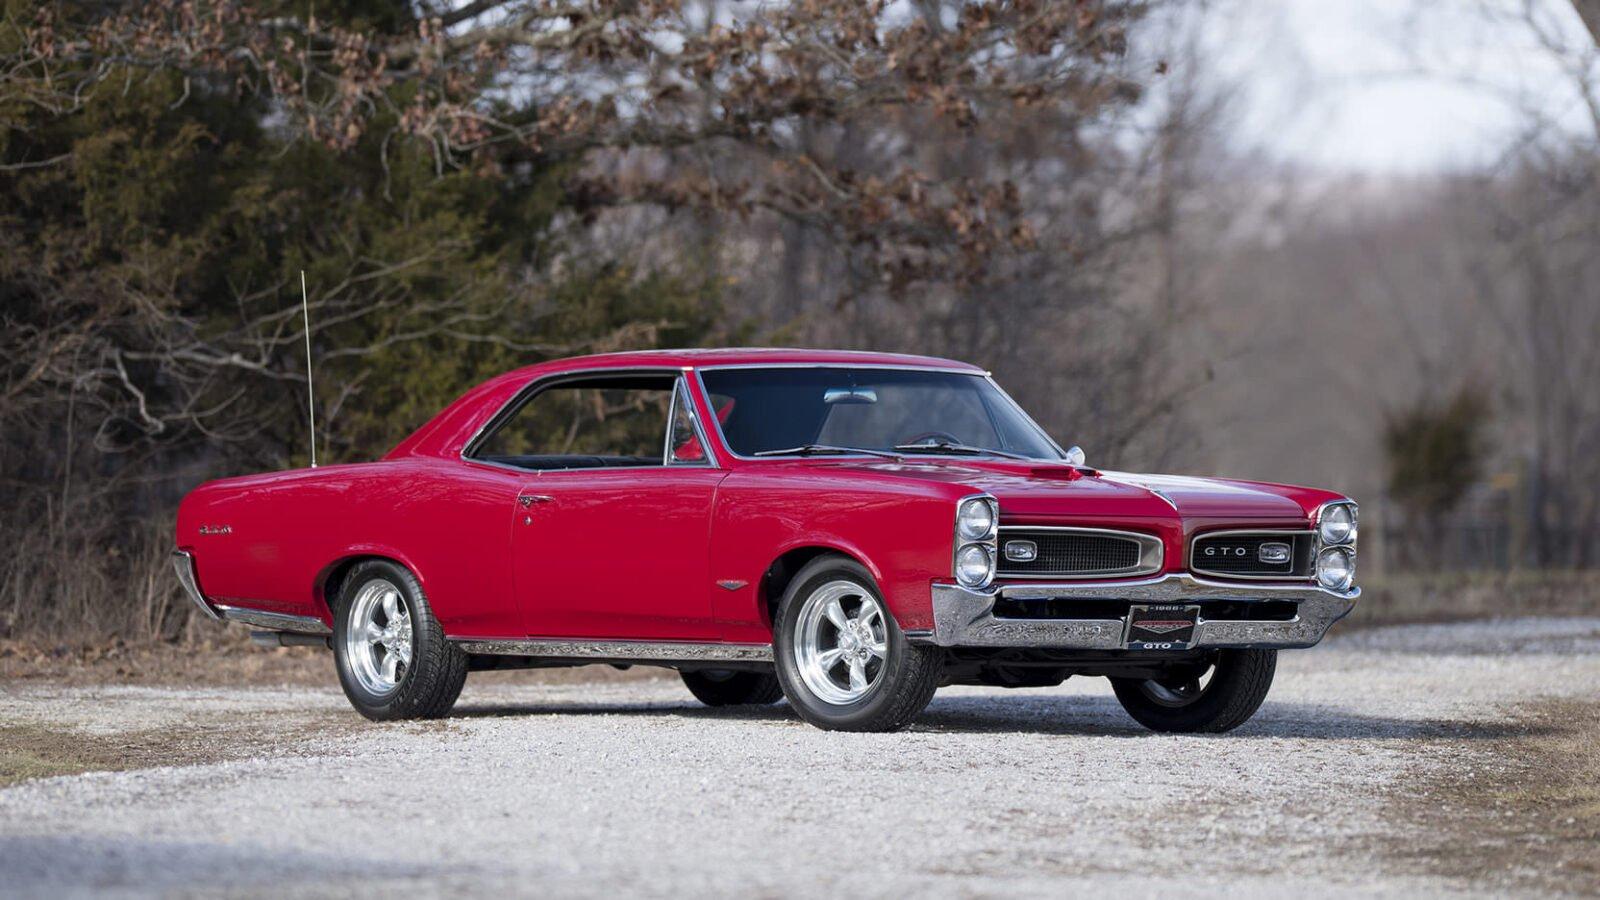 Pontiac GTO Front Angle 1600x900 - 1966 Pontiac GTO